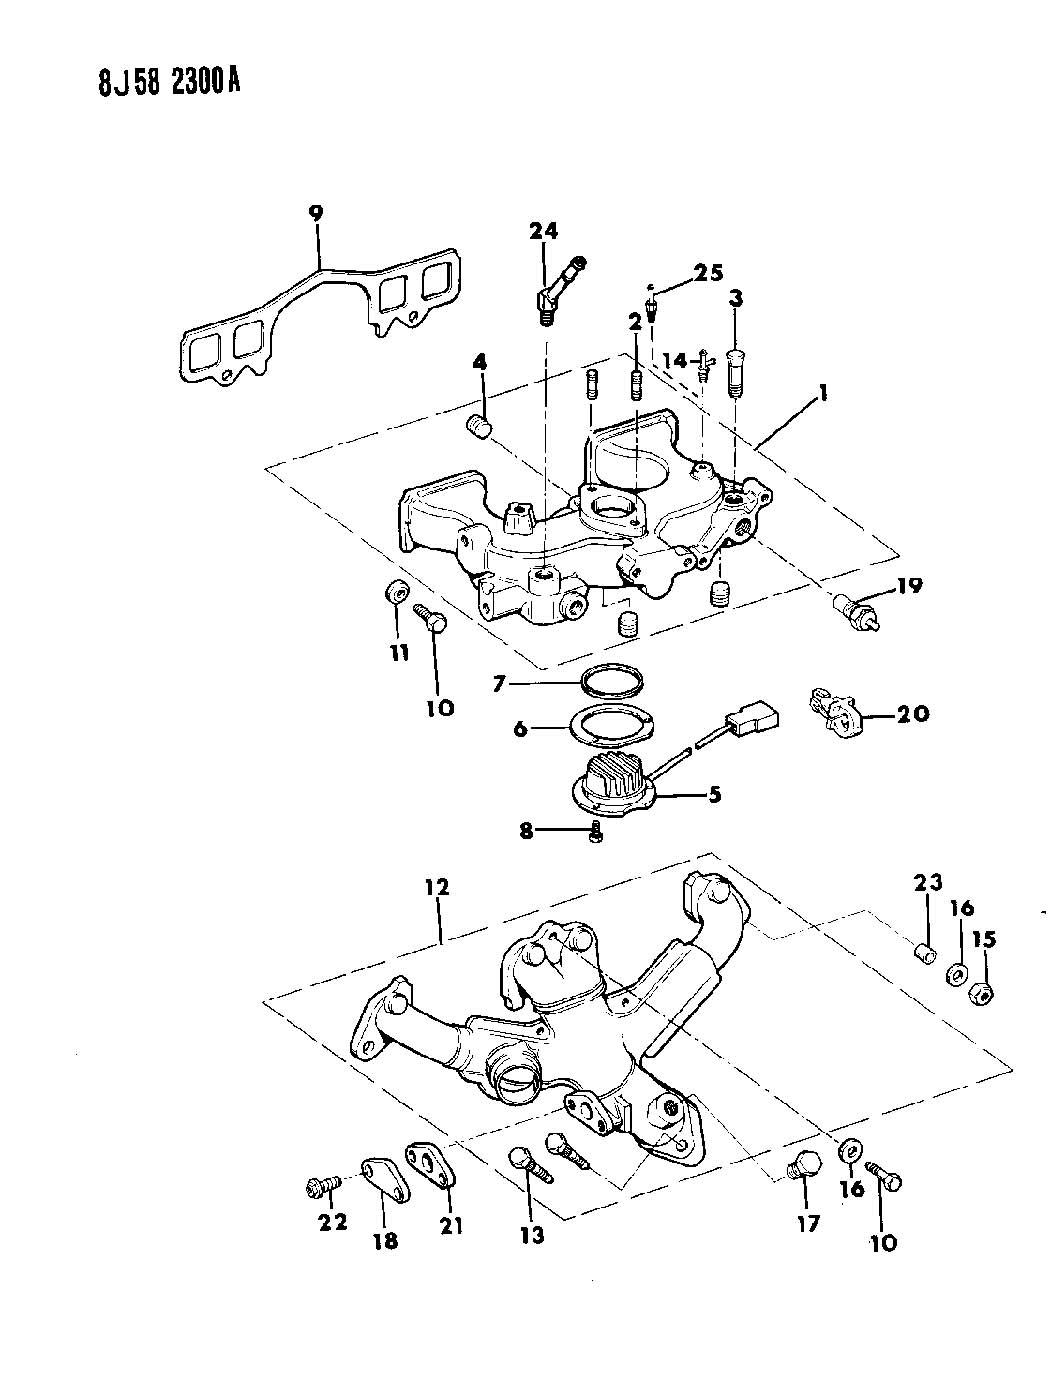 Jeep Wrangler Manifold